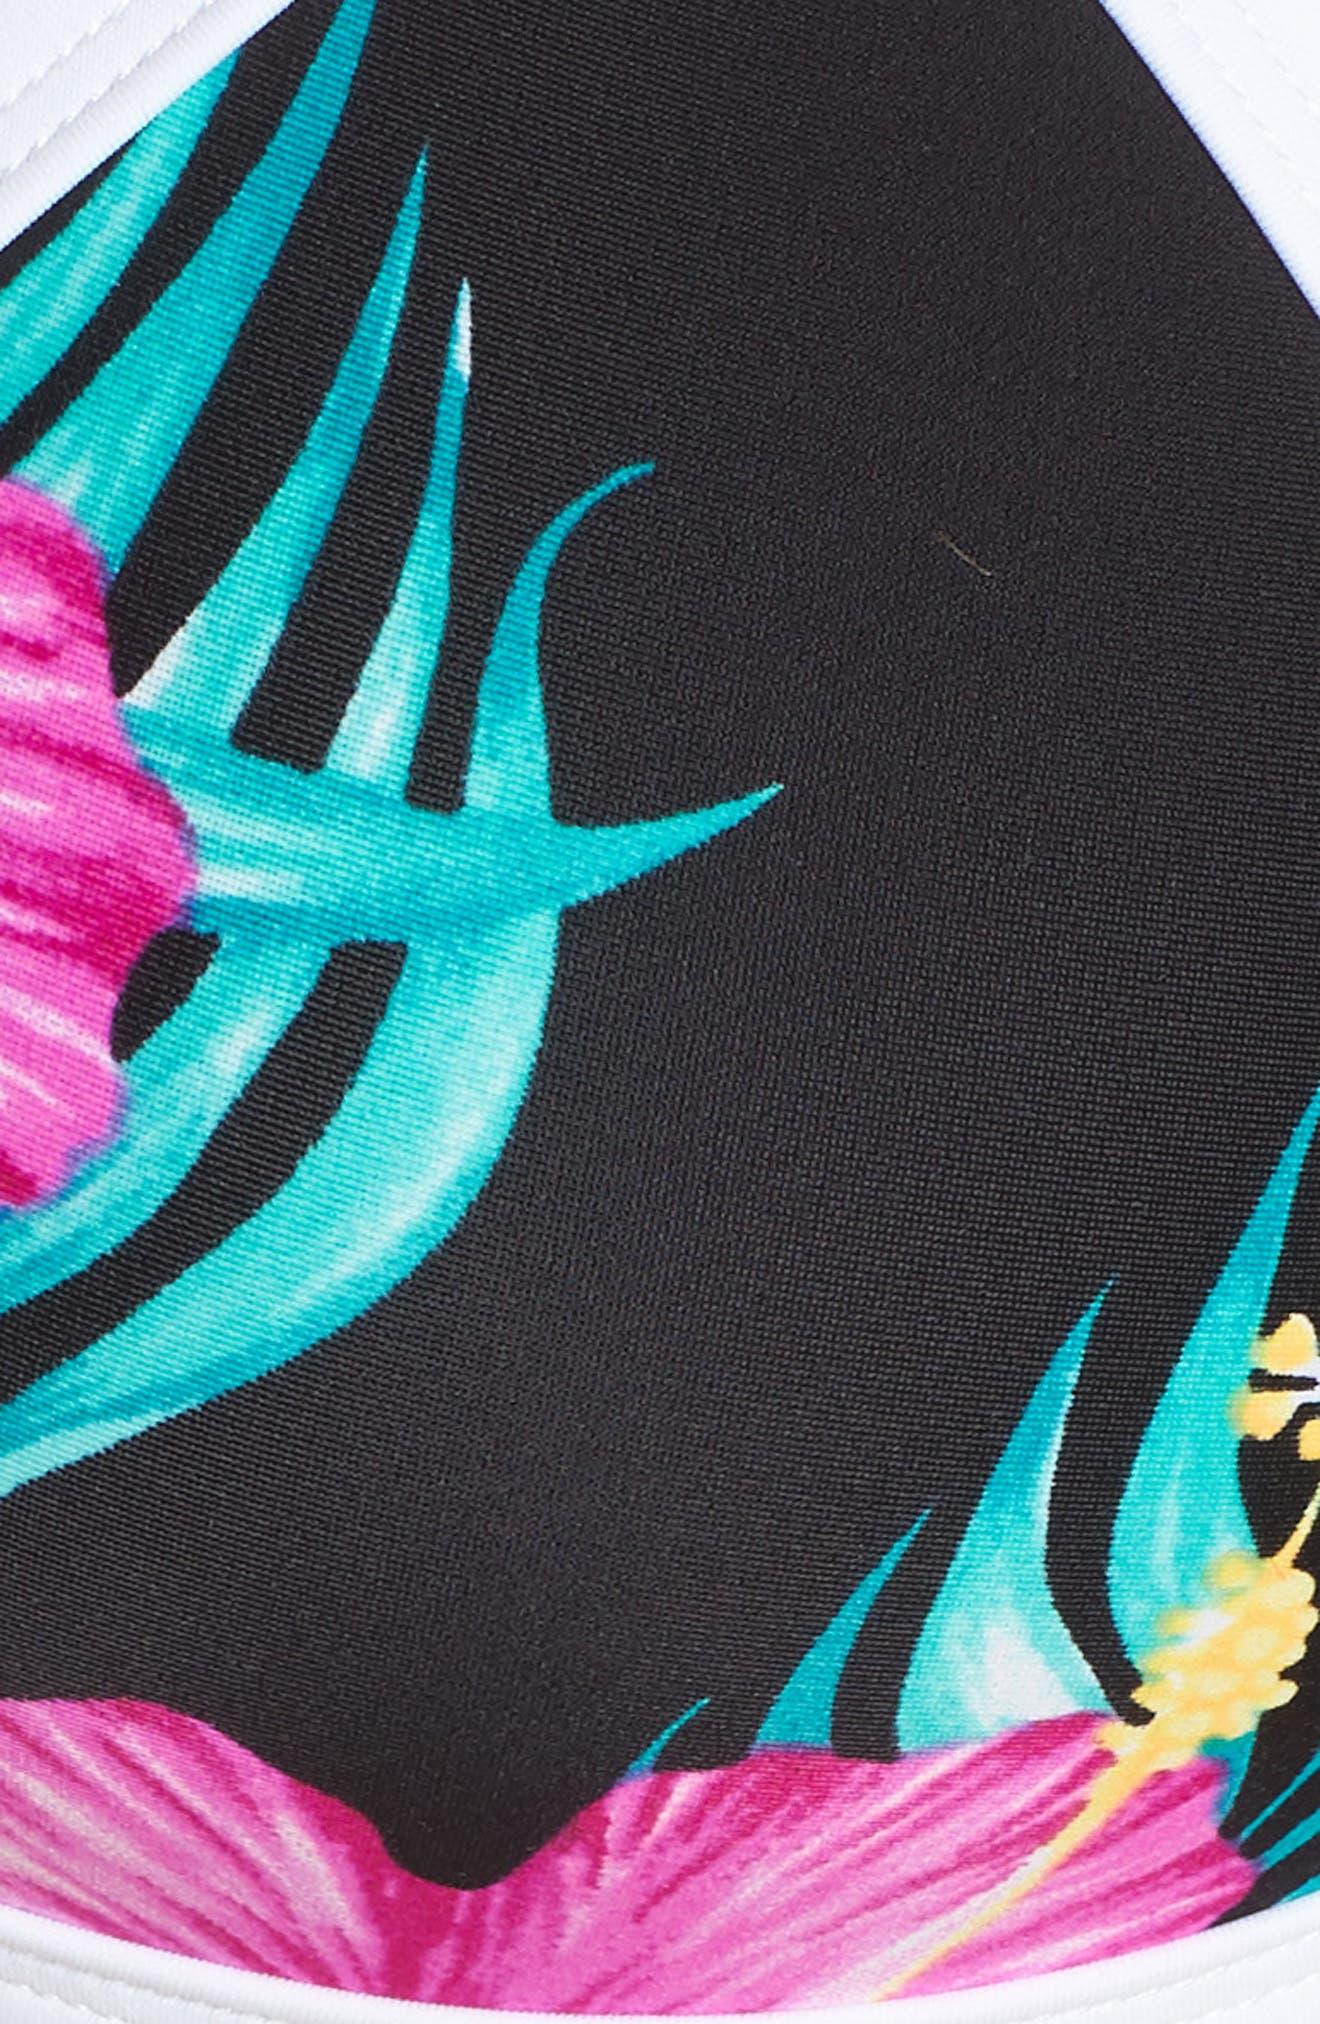 Molokai Love Bikini Top,                             Alternate thumbnail 8, color,                             Black